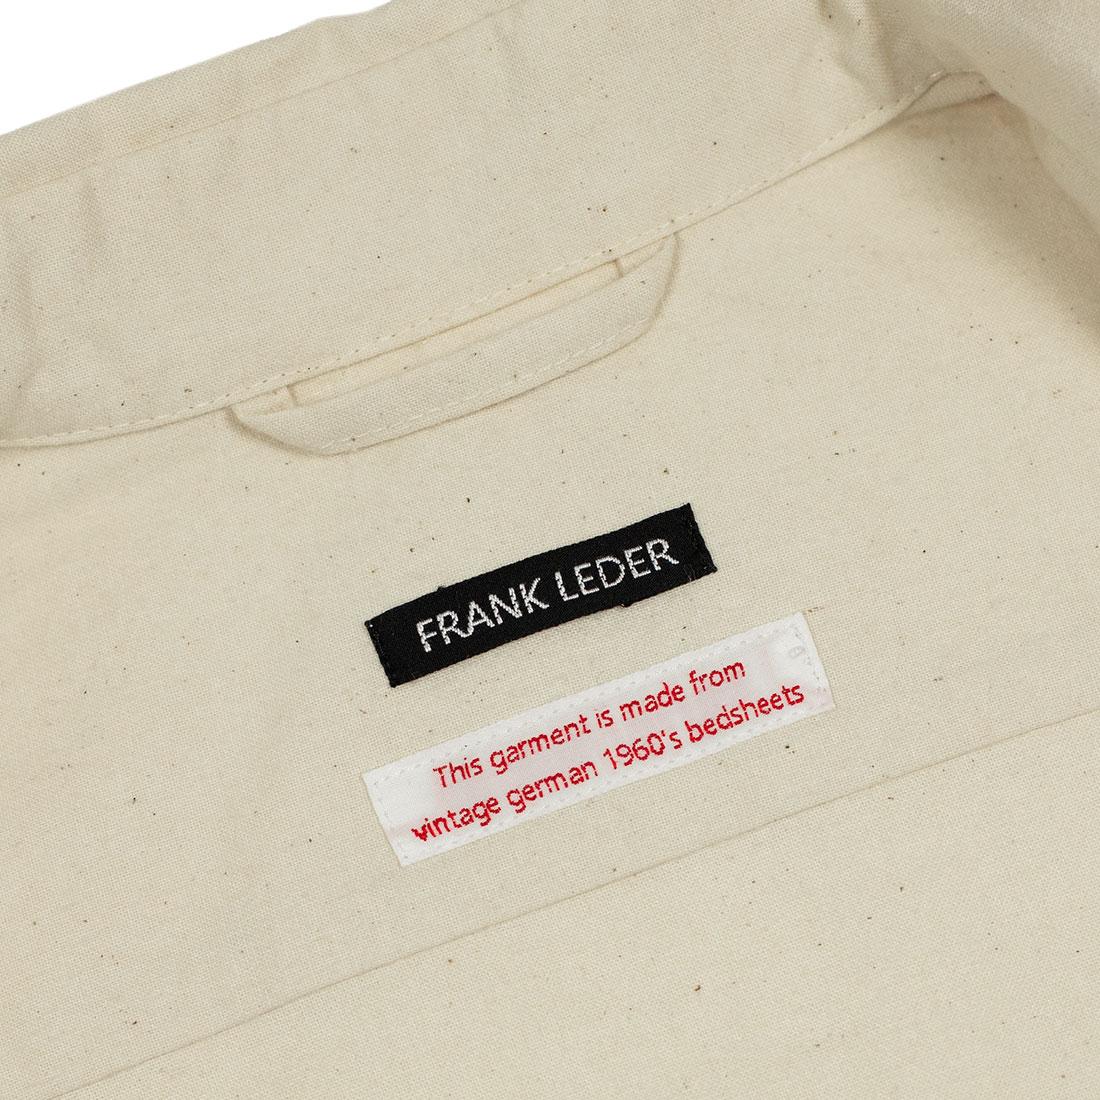 Frank Leder Spring Summer 2021 SS21 Made in Germany deadstock bedlinen shirt jacket (5).jpg